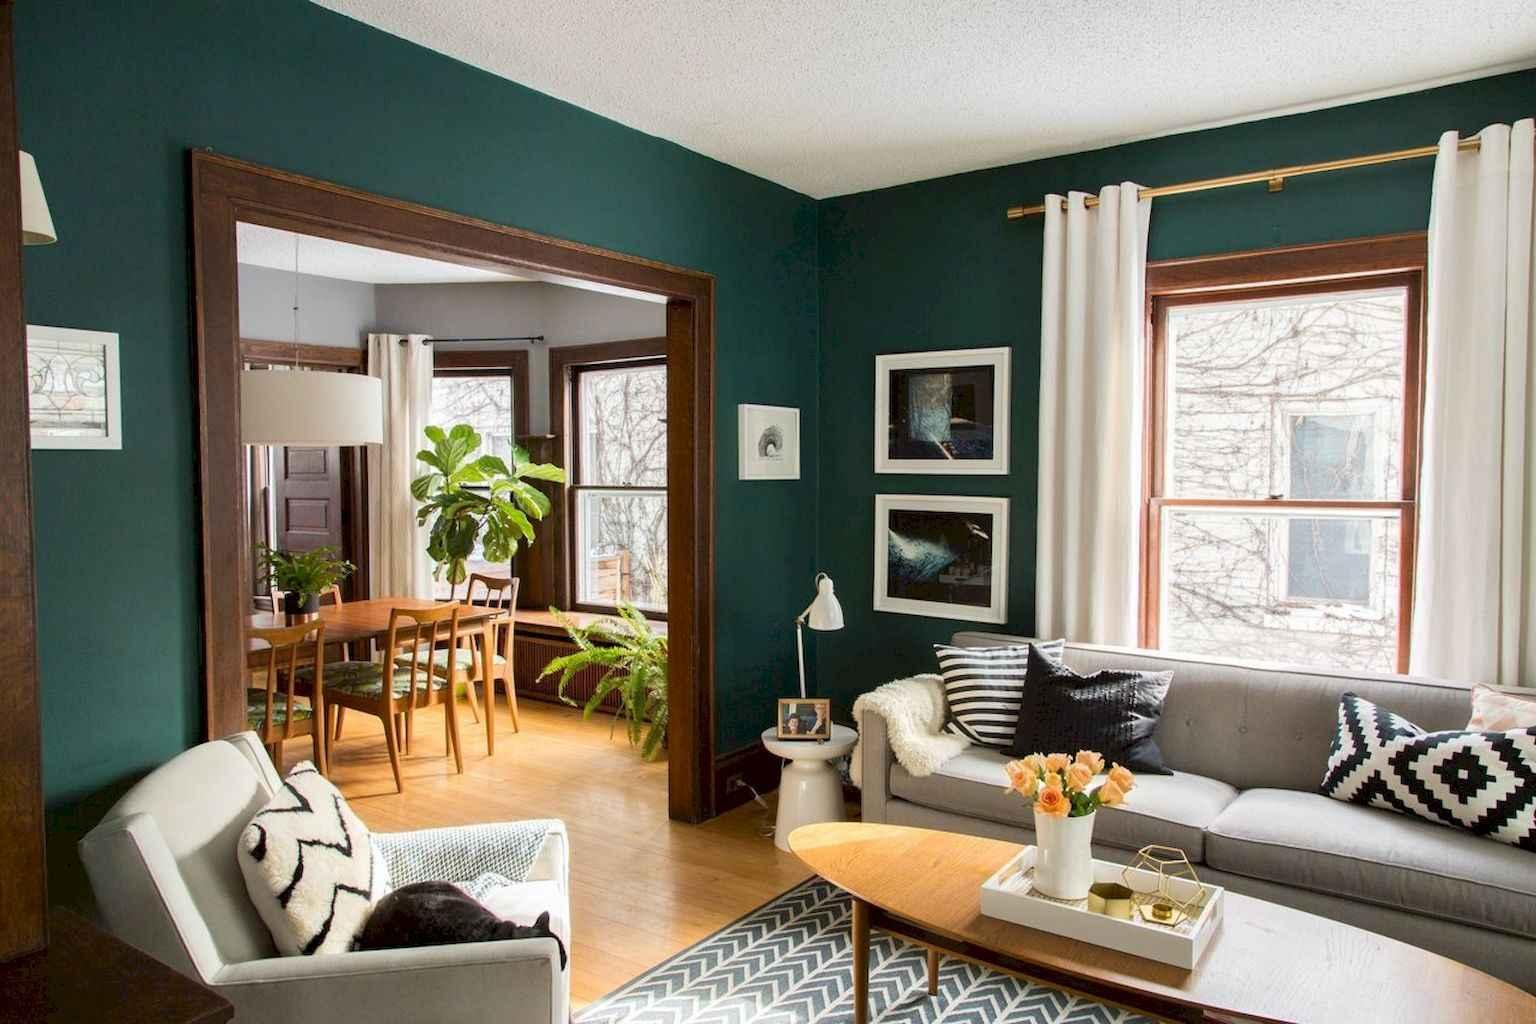 80 pretty modern apartment living room decor ideas 35 for Living room 80s